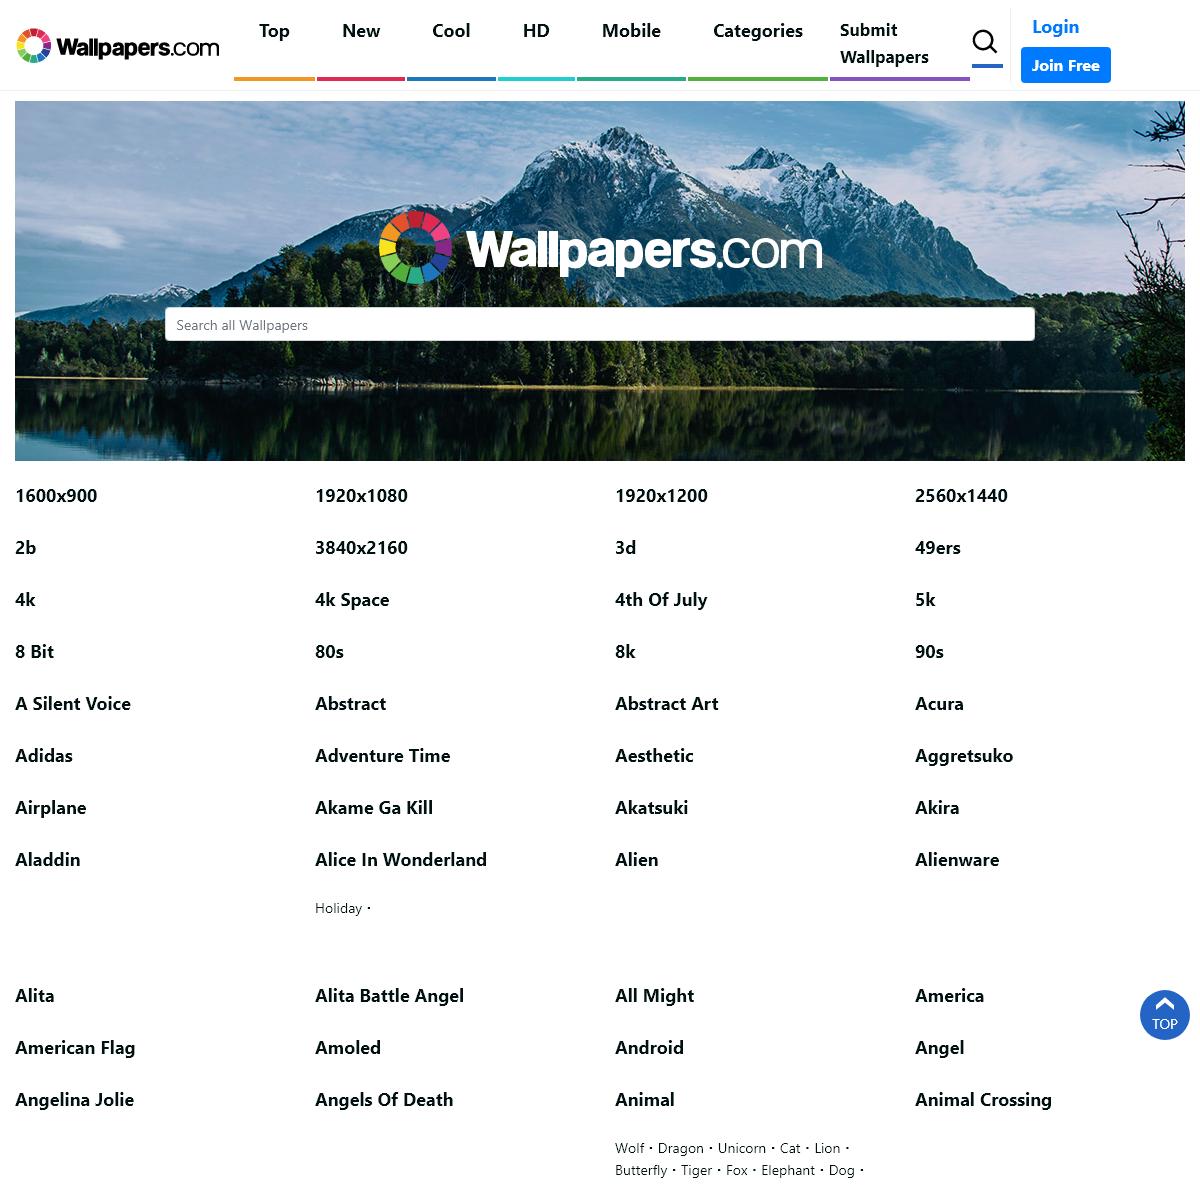 Wallpapers.com - 40,000+ Free HD Wallpapers for Desktop & Mobiles